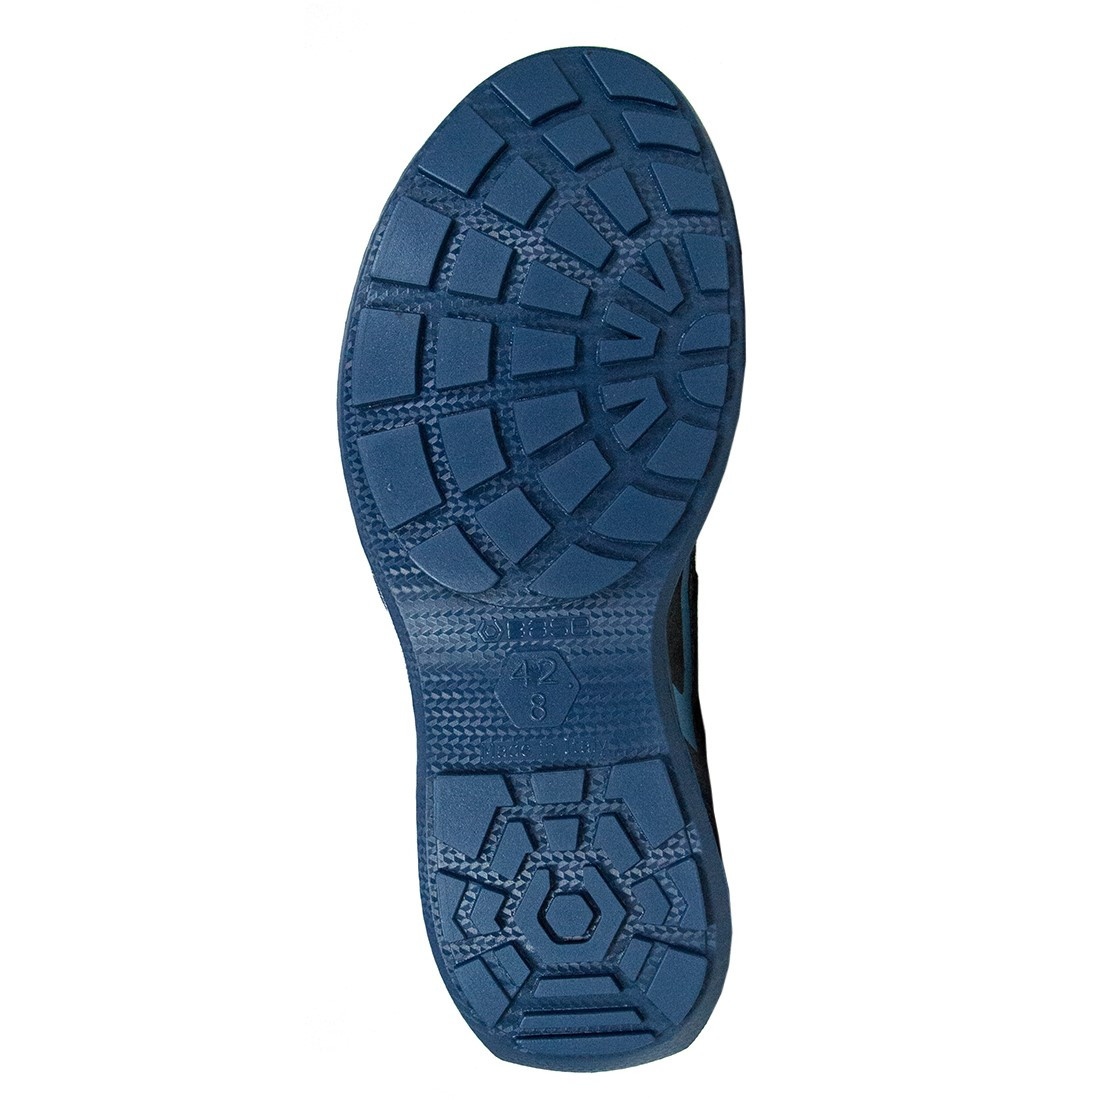 Pantofi Bowling - Tennis S3 SRC - Incaltaminte de protectie